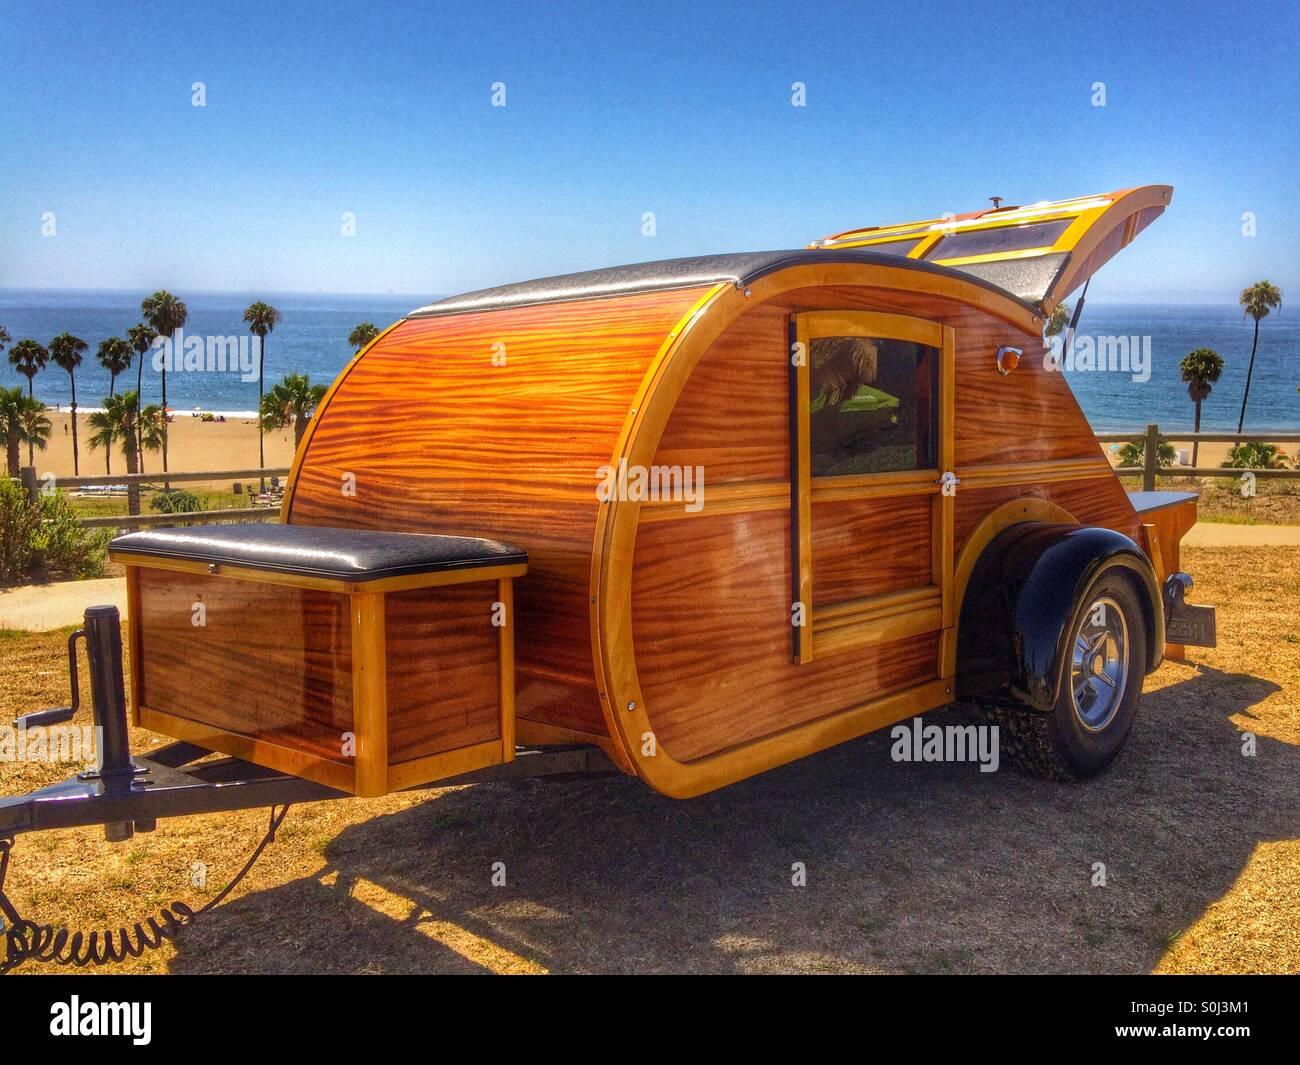 A 1948 wooden teardrop trailer camper in santa barbara for Tiny house santa barbara